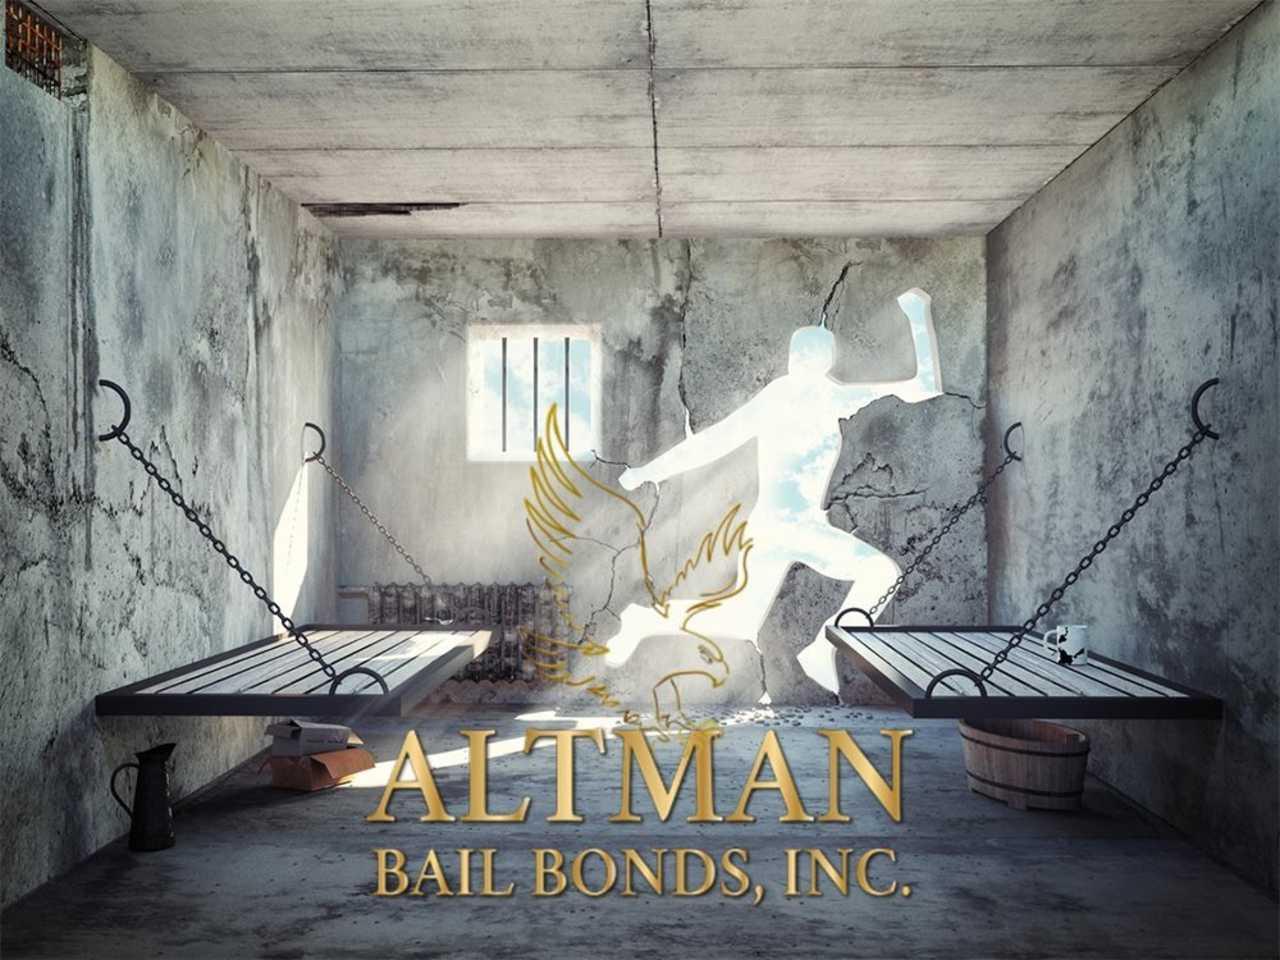 Altman Bail Bonds, Inc. - Legal - Attorneys in Tavares  FL